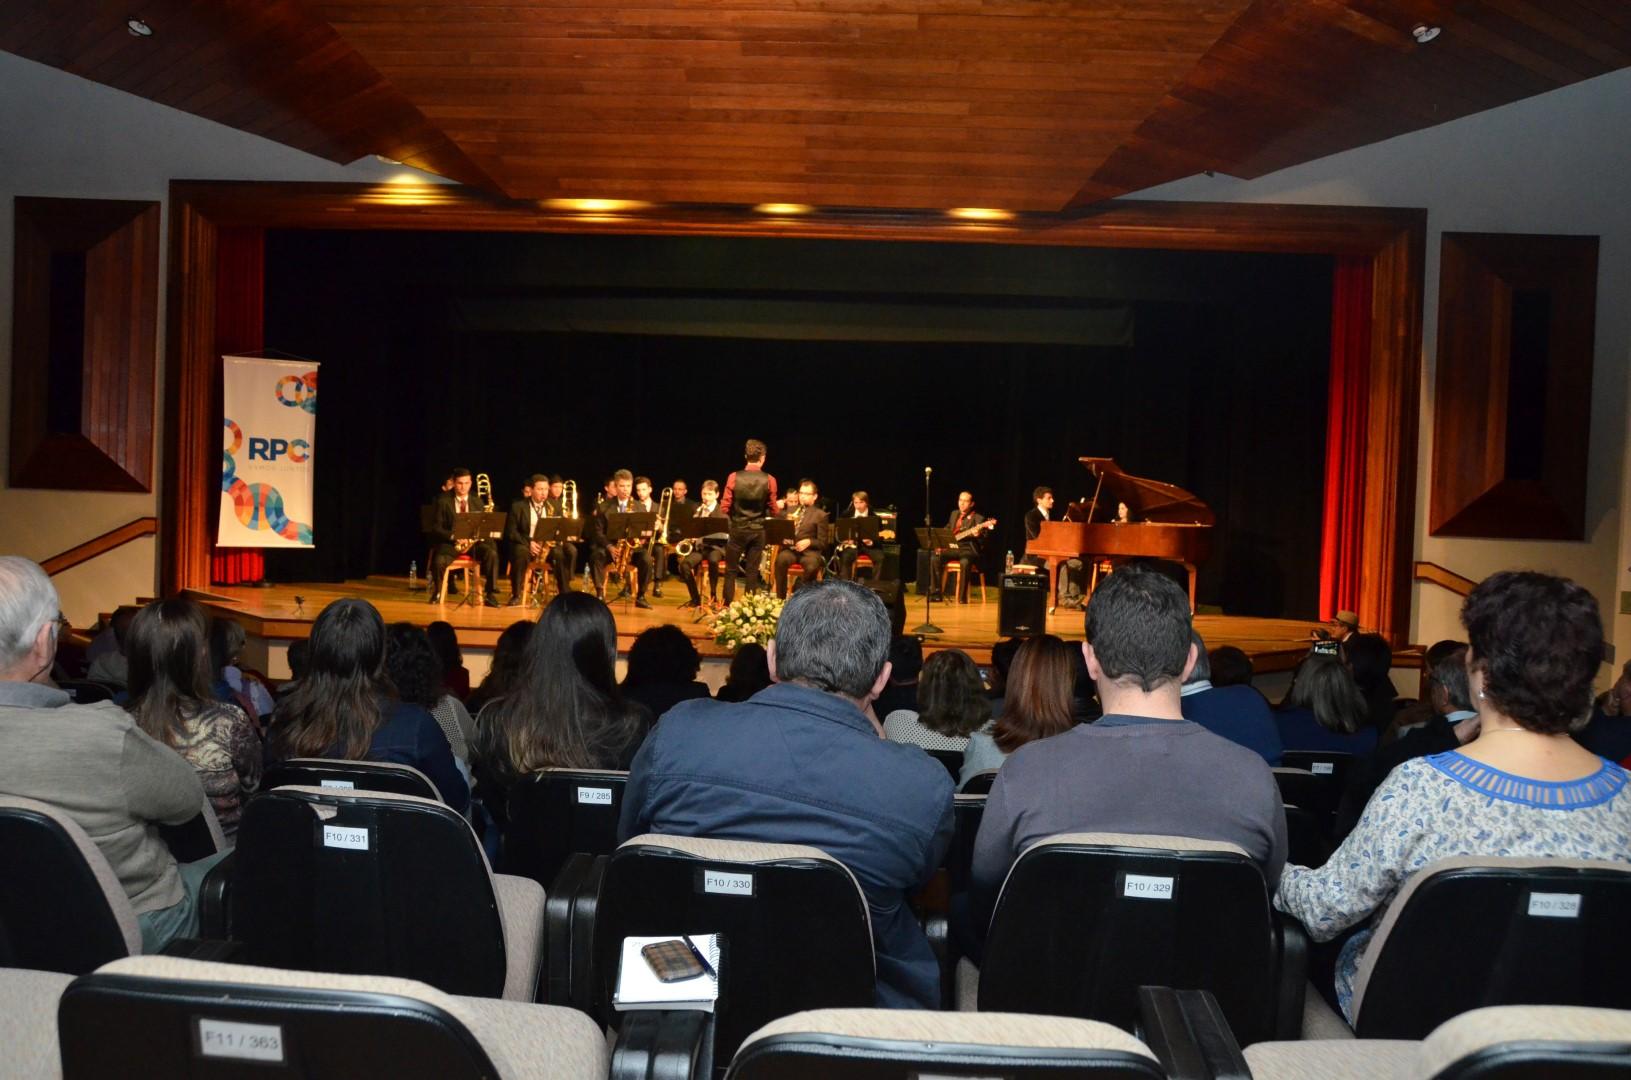 Big Band Belas Artes - 19.07.15Big Band Belas Artes - 19.07.15